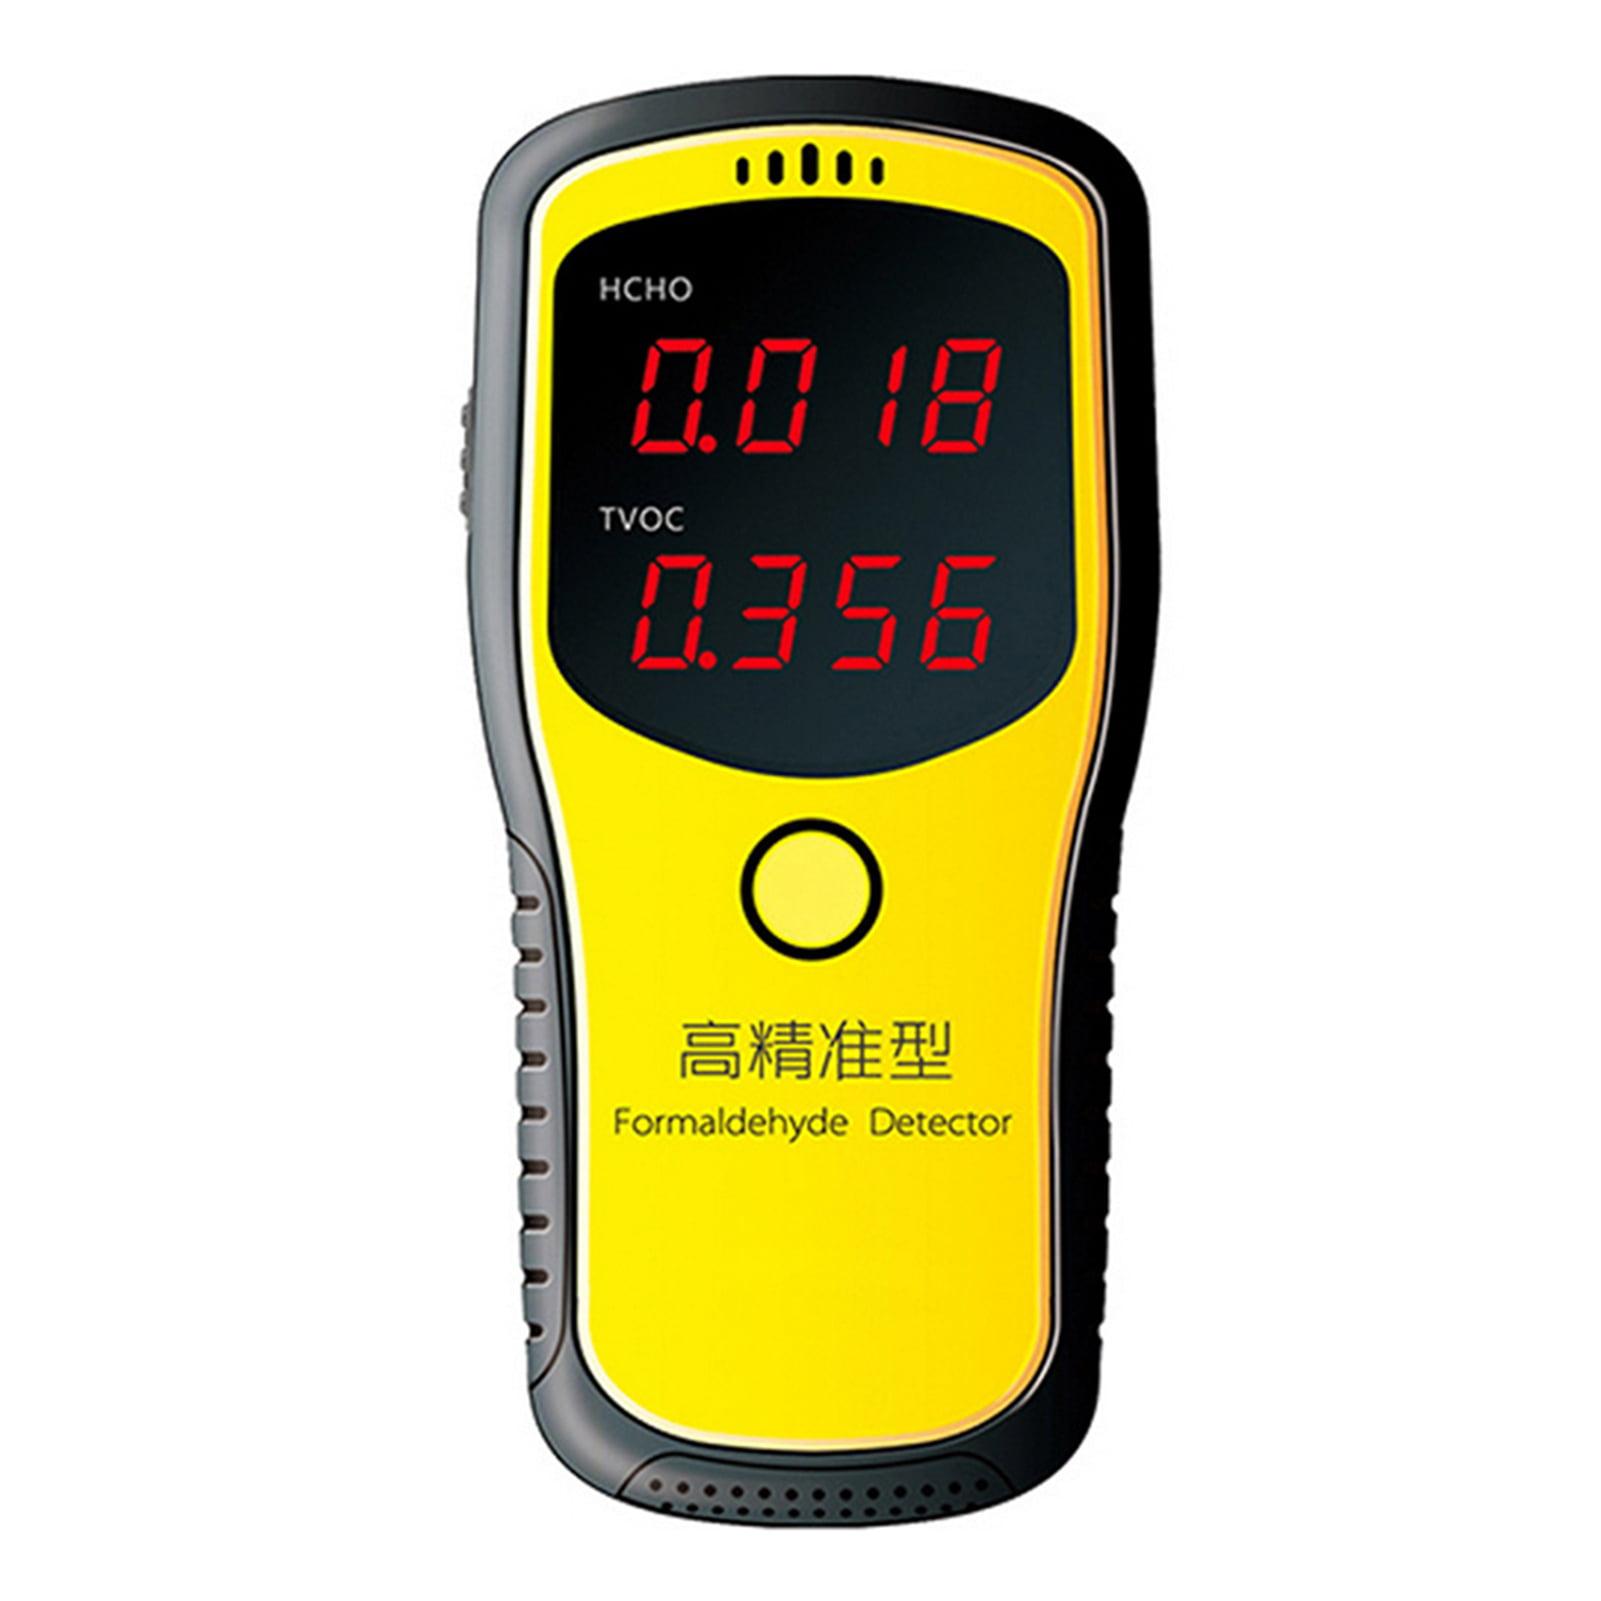 Portable Digital Air Analyzer Dust Sensor Air Pollution Detection Device InLoveArts Handhold Air Quality Detector Formald/éhyde TVOC HCHO CO2 Gas Monitor